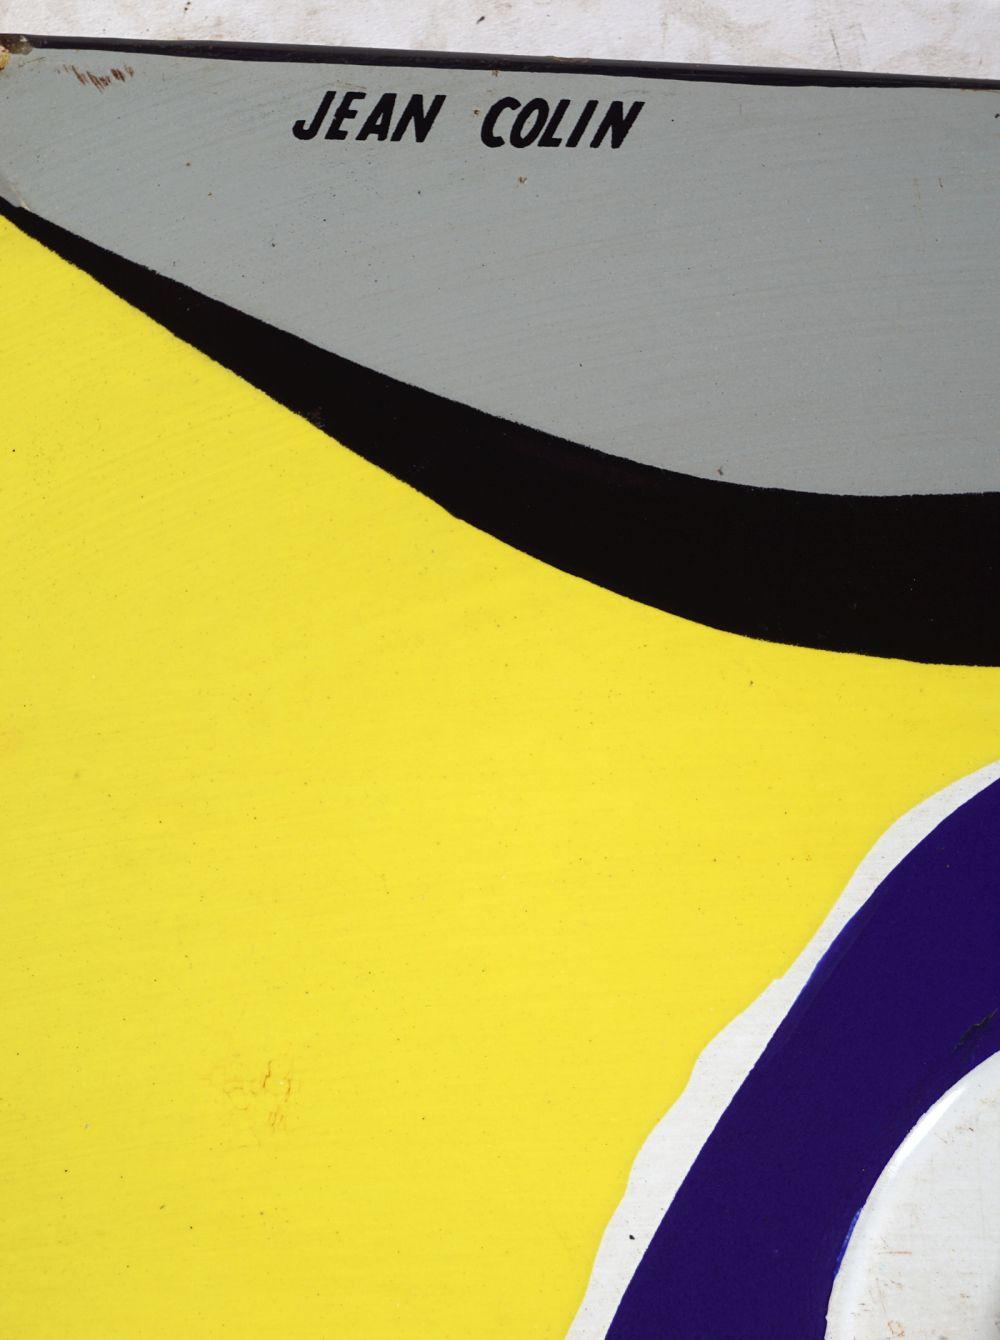 CINZANO ORIGINAL ENAMELLED SIGN - Image 4 of 6